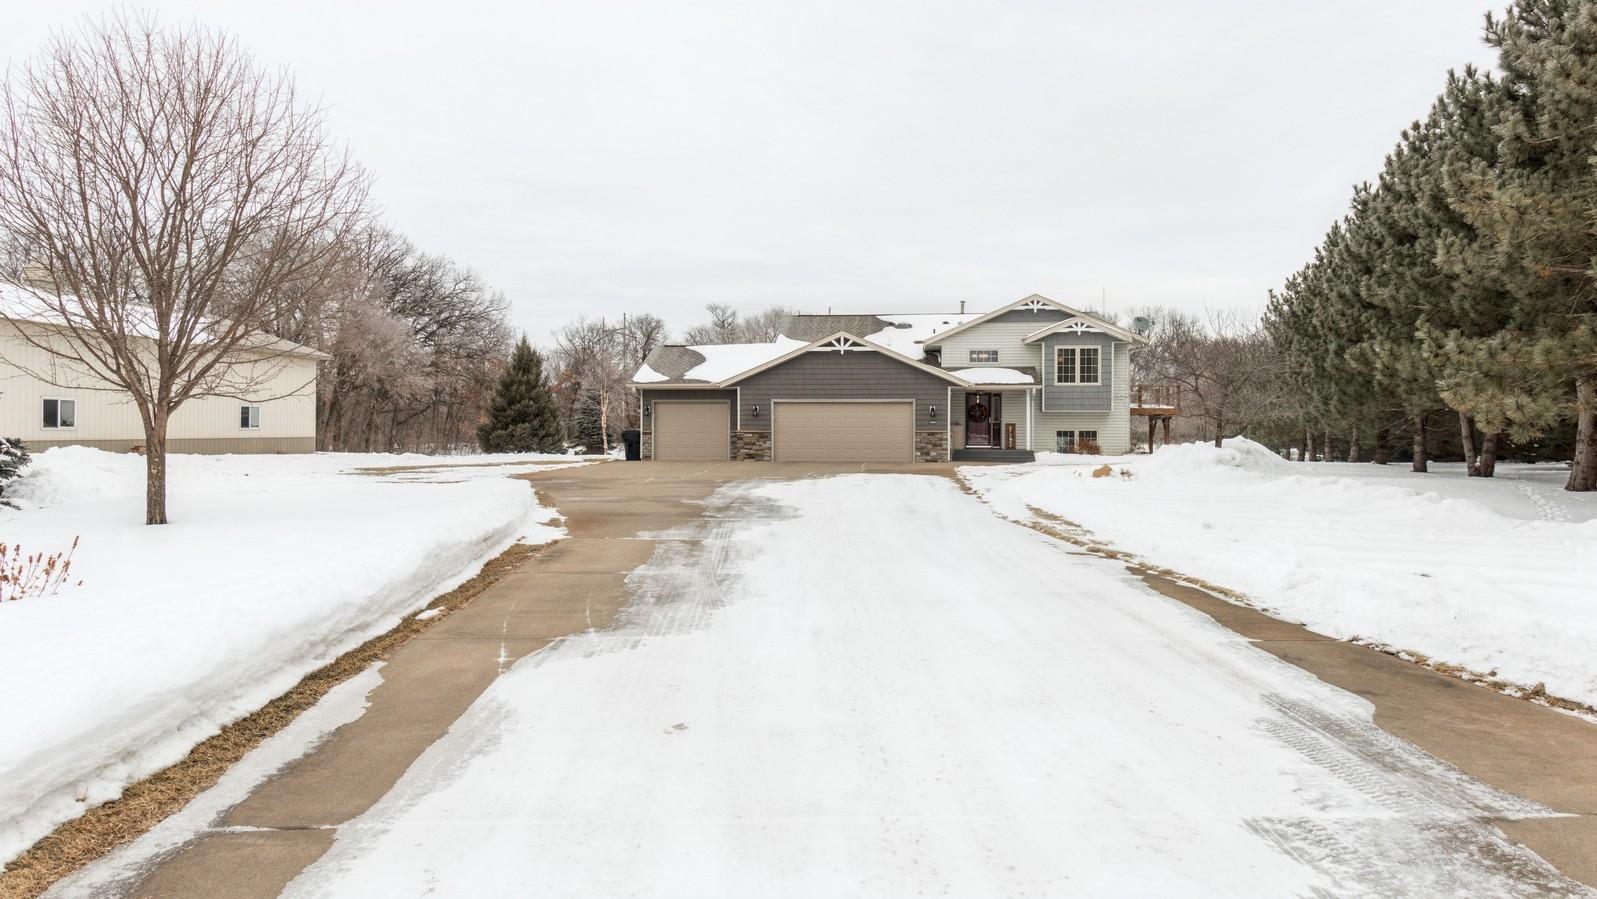 21850 186th Street NW Property Photo - Big Lake, MN real estate listing